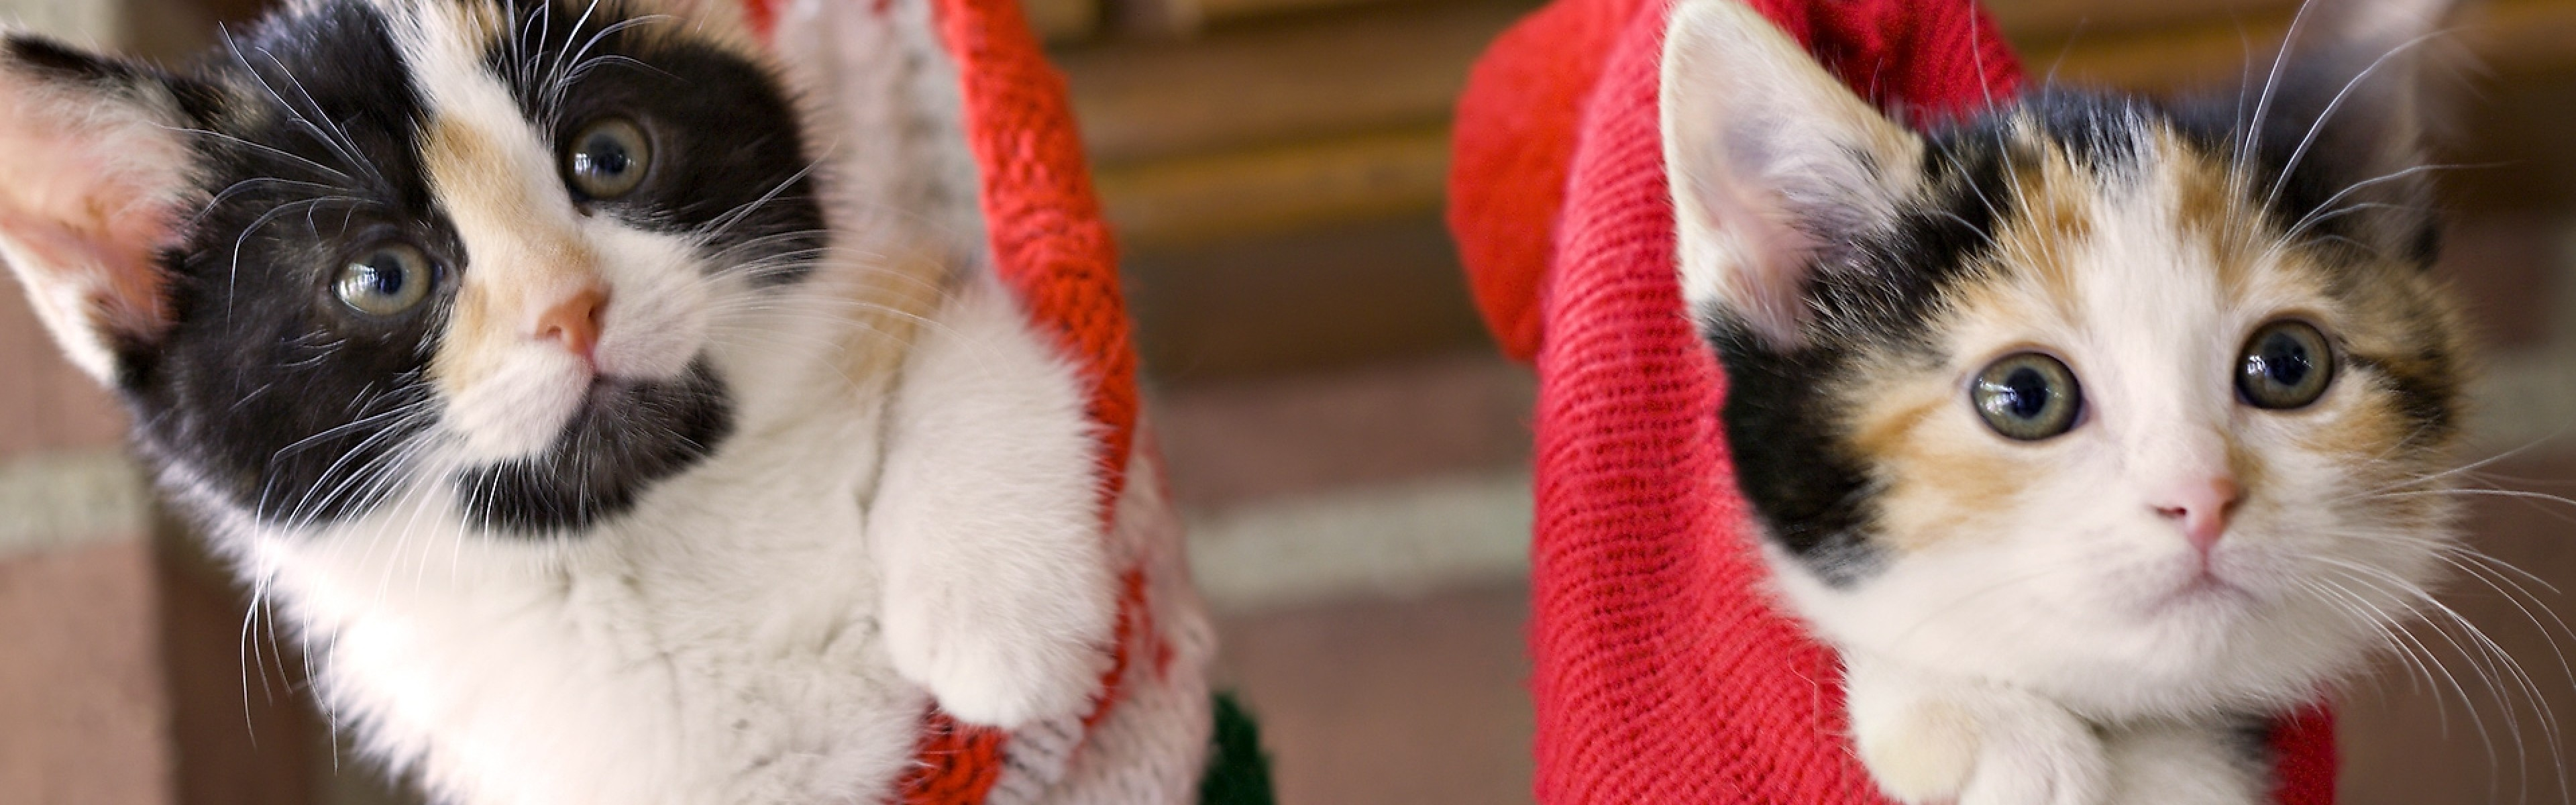 Wallpaper kittens, hang, socks, holiday, christmas, fluffy, couple